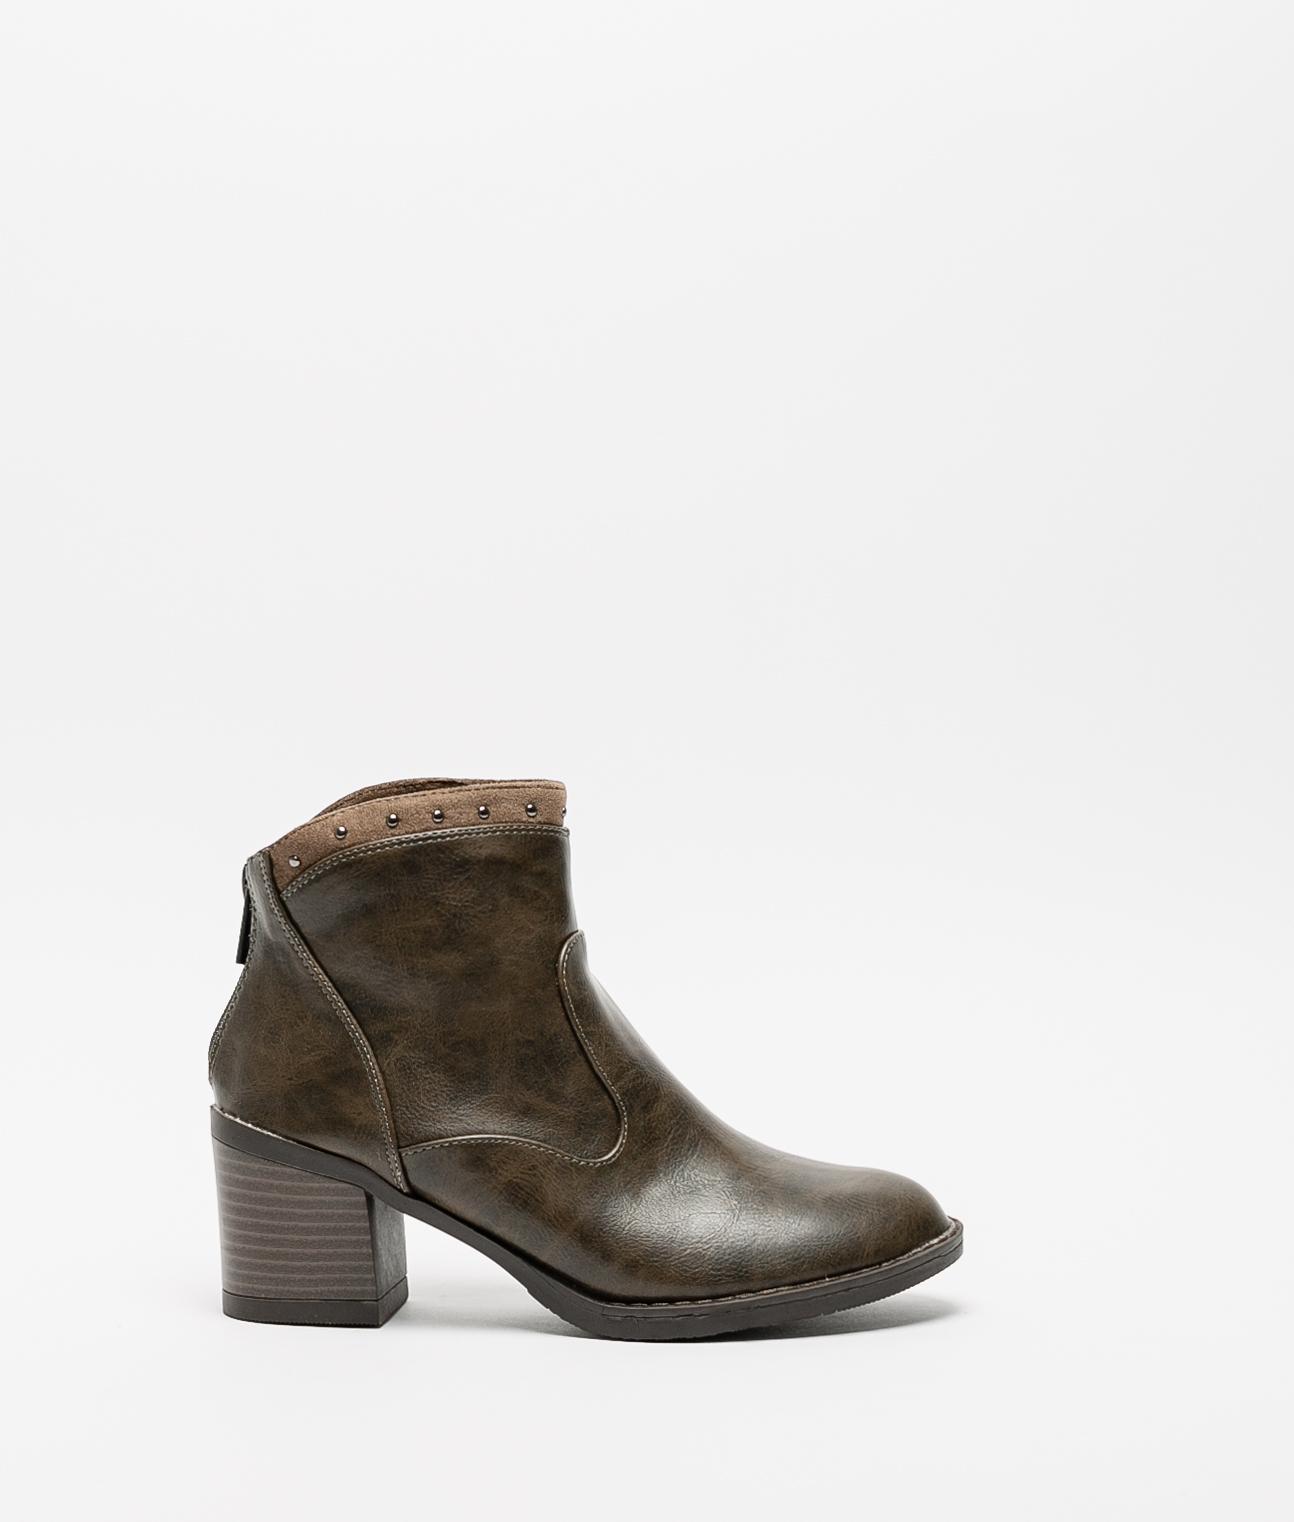 Boot Petite Tiusa - Kaki